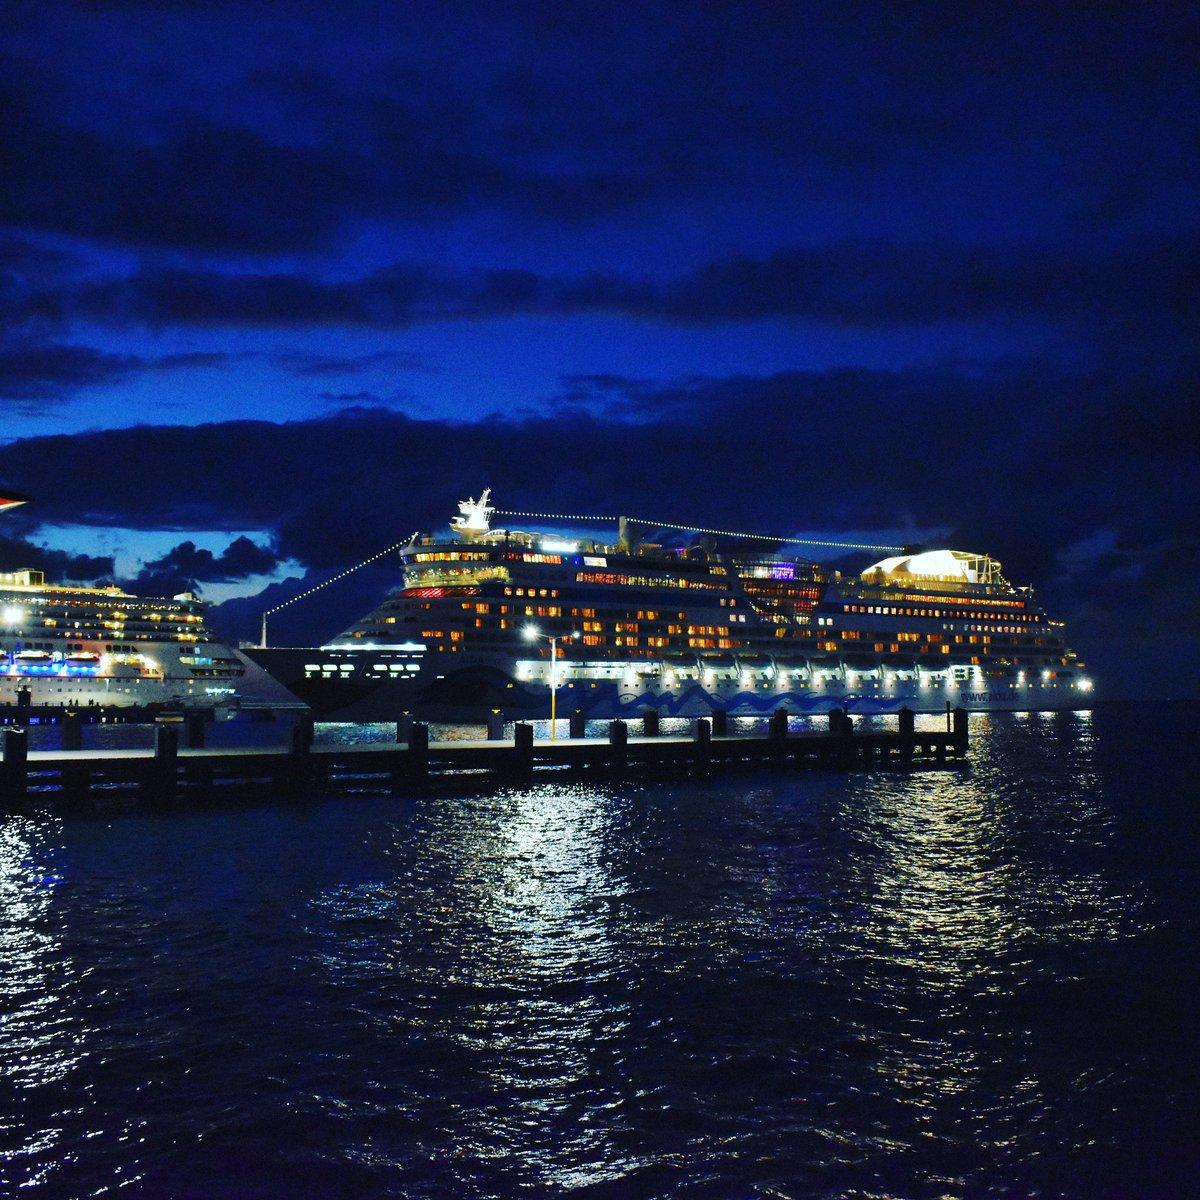 AIDA in Cozumel  #adventuretime #beach #mar #caribbeansea #caribe #paradise #vacation #happy #cozumelisland #costamaya #beachday #aida #aidacruises #cruiseship #kreuzfahrt #aidamomente #kreuzfahrtliebe pic.twitter.com/v9CyEGIOSj